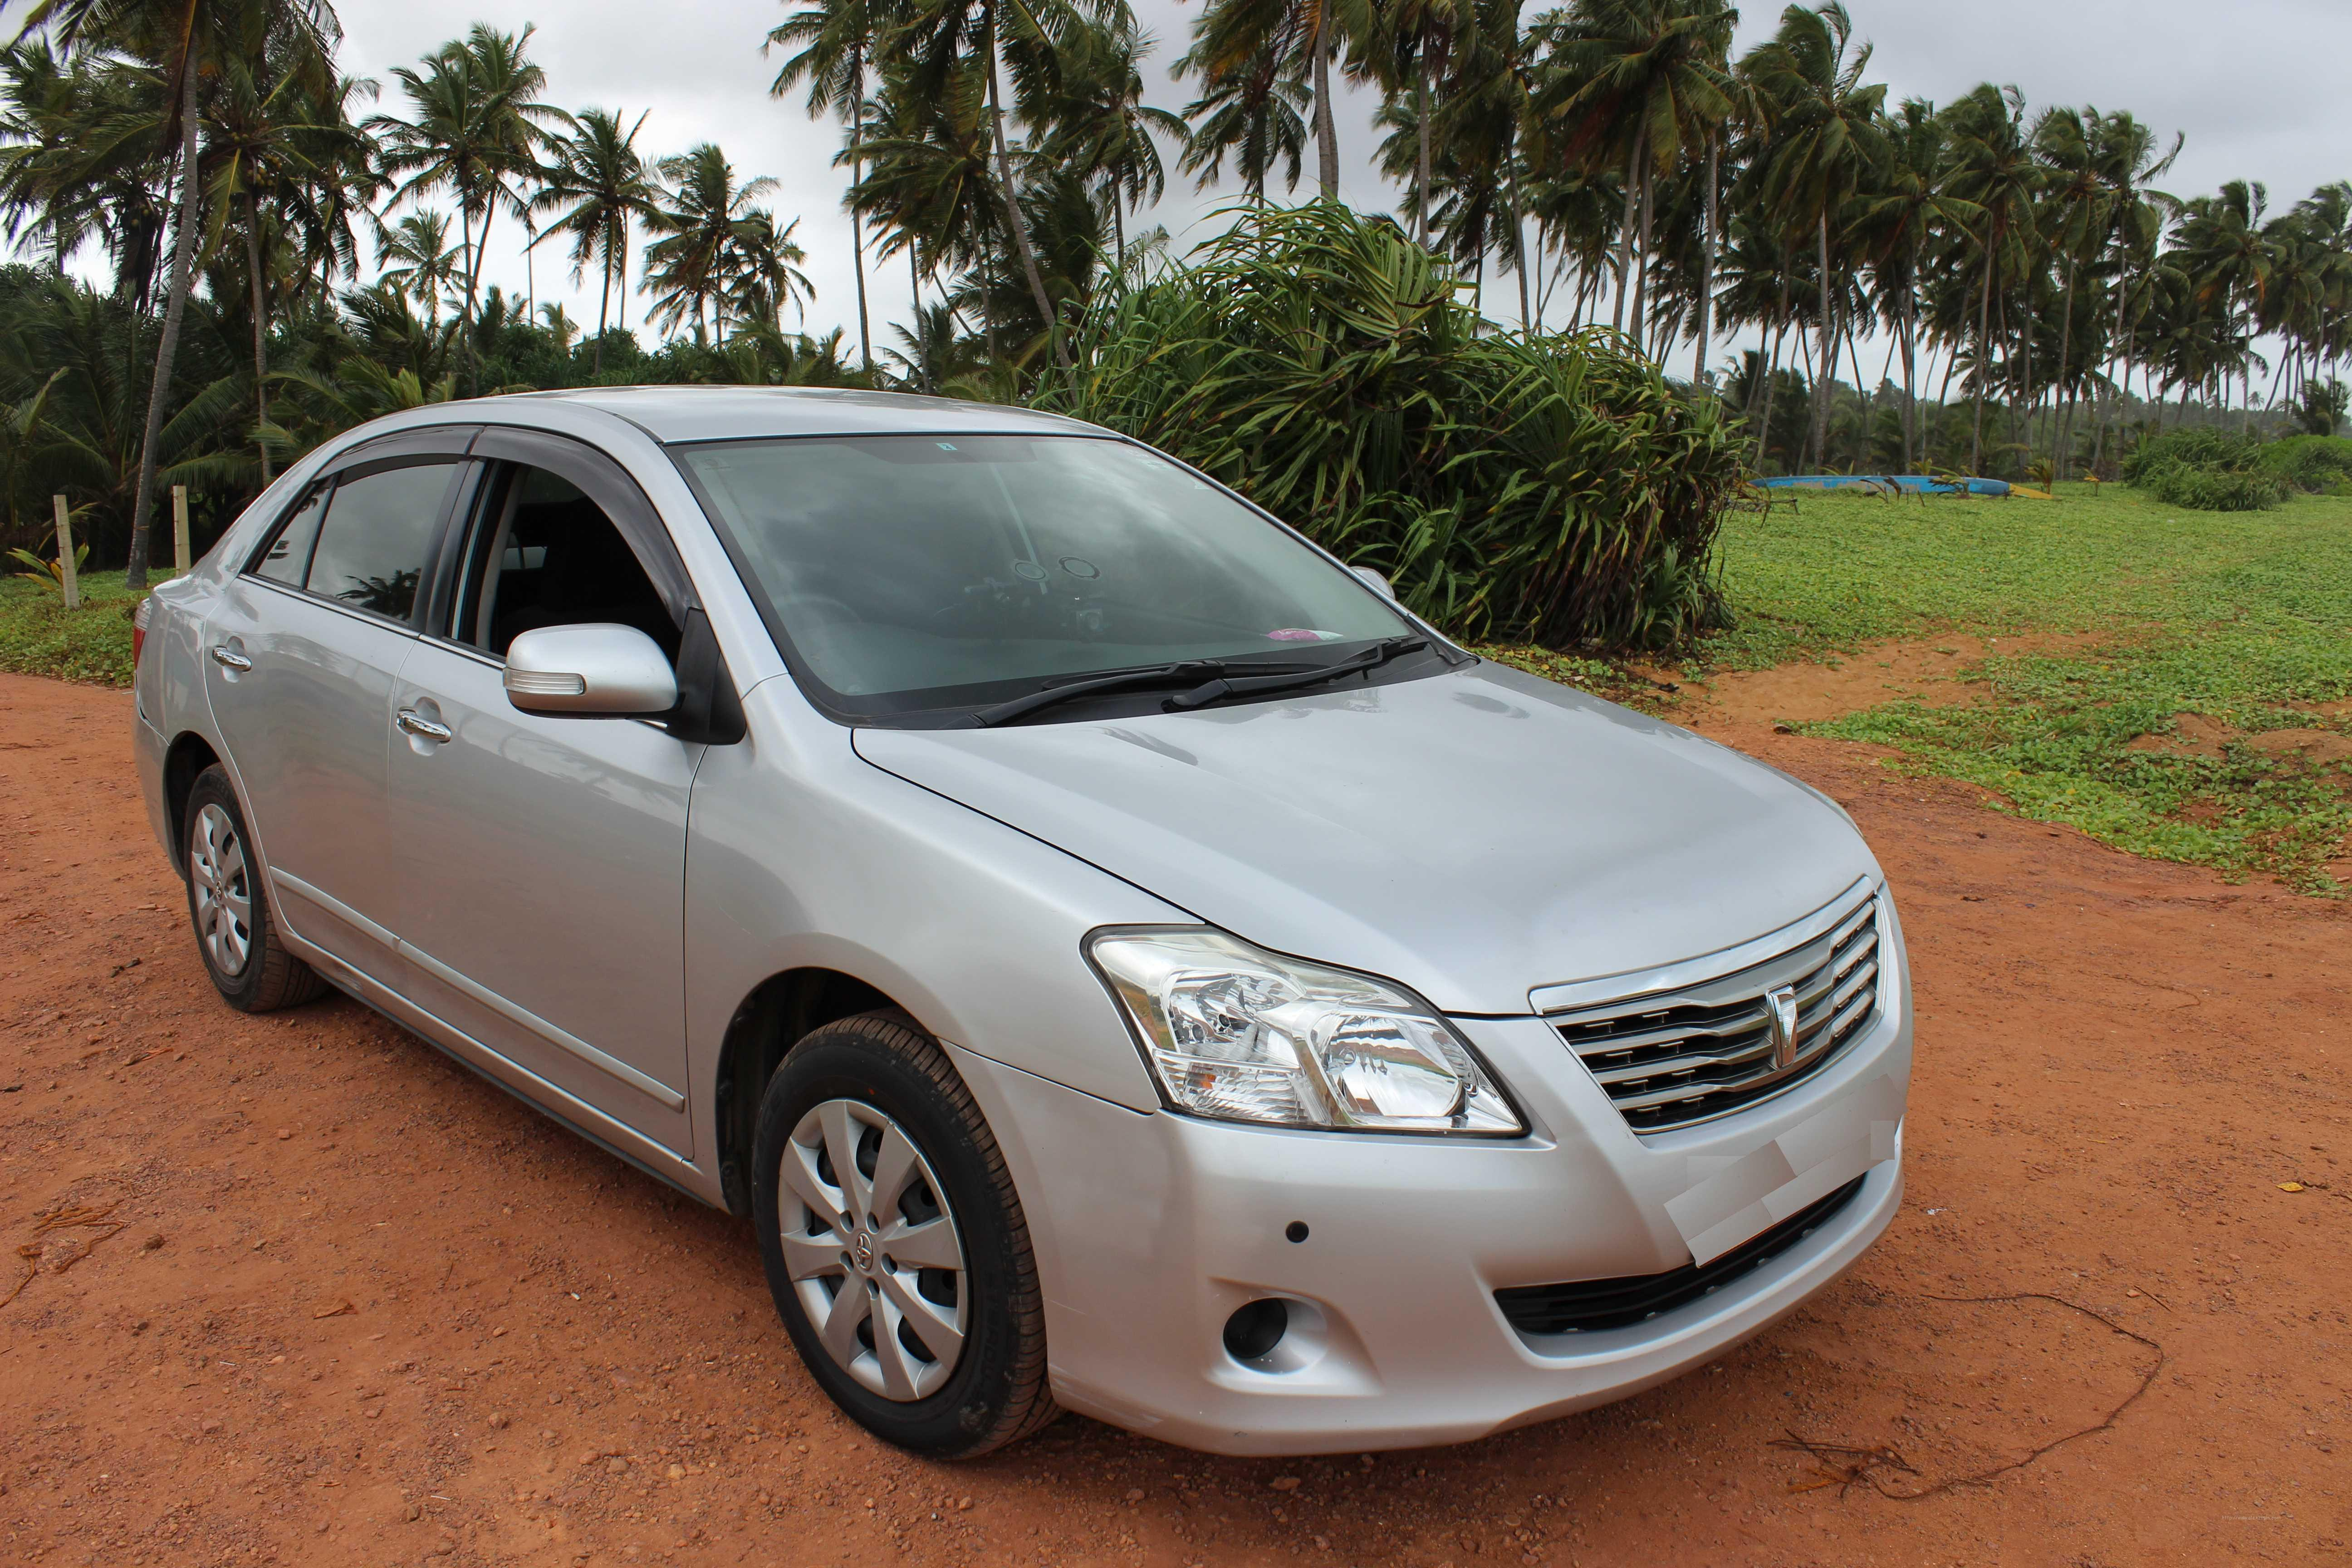 Шри Ланка саомстоятельно на авто в июле миниатюра